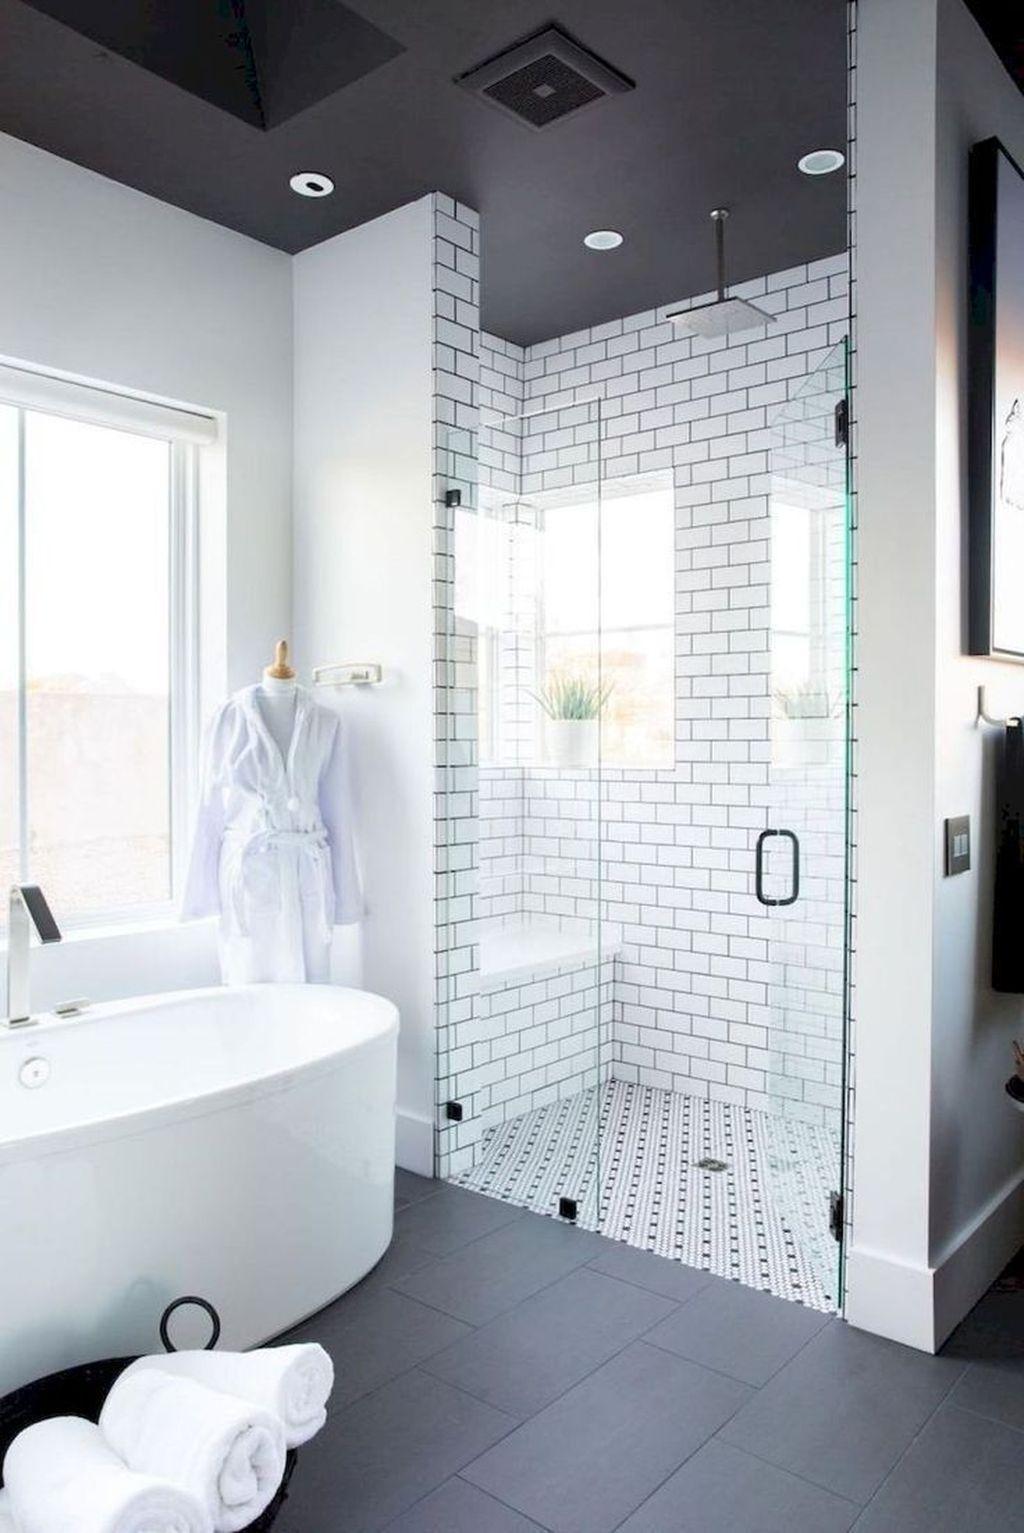 42 Perfect Shower Design Ideas To Remodel Your Bathroom Bathroomandshowerdesigns Farmhouse Master Bathroom Bathroom Remodel Master Small Master Bathroom